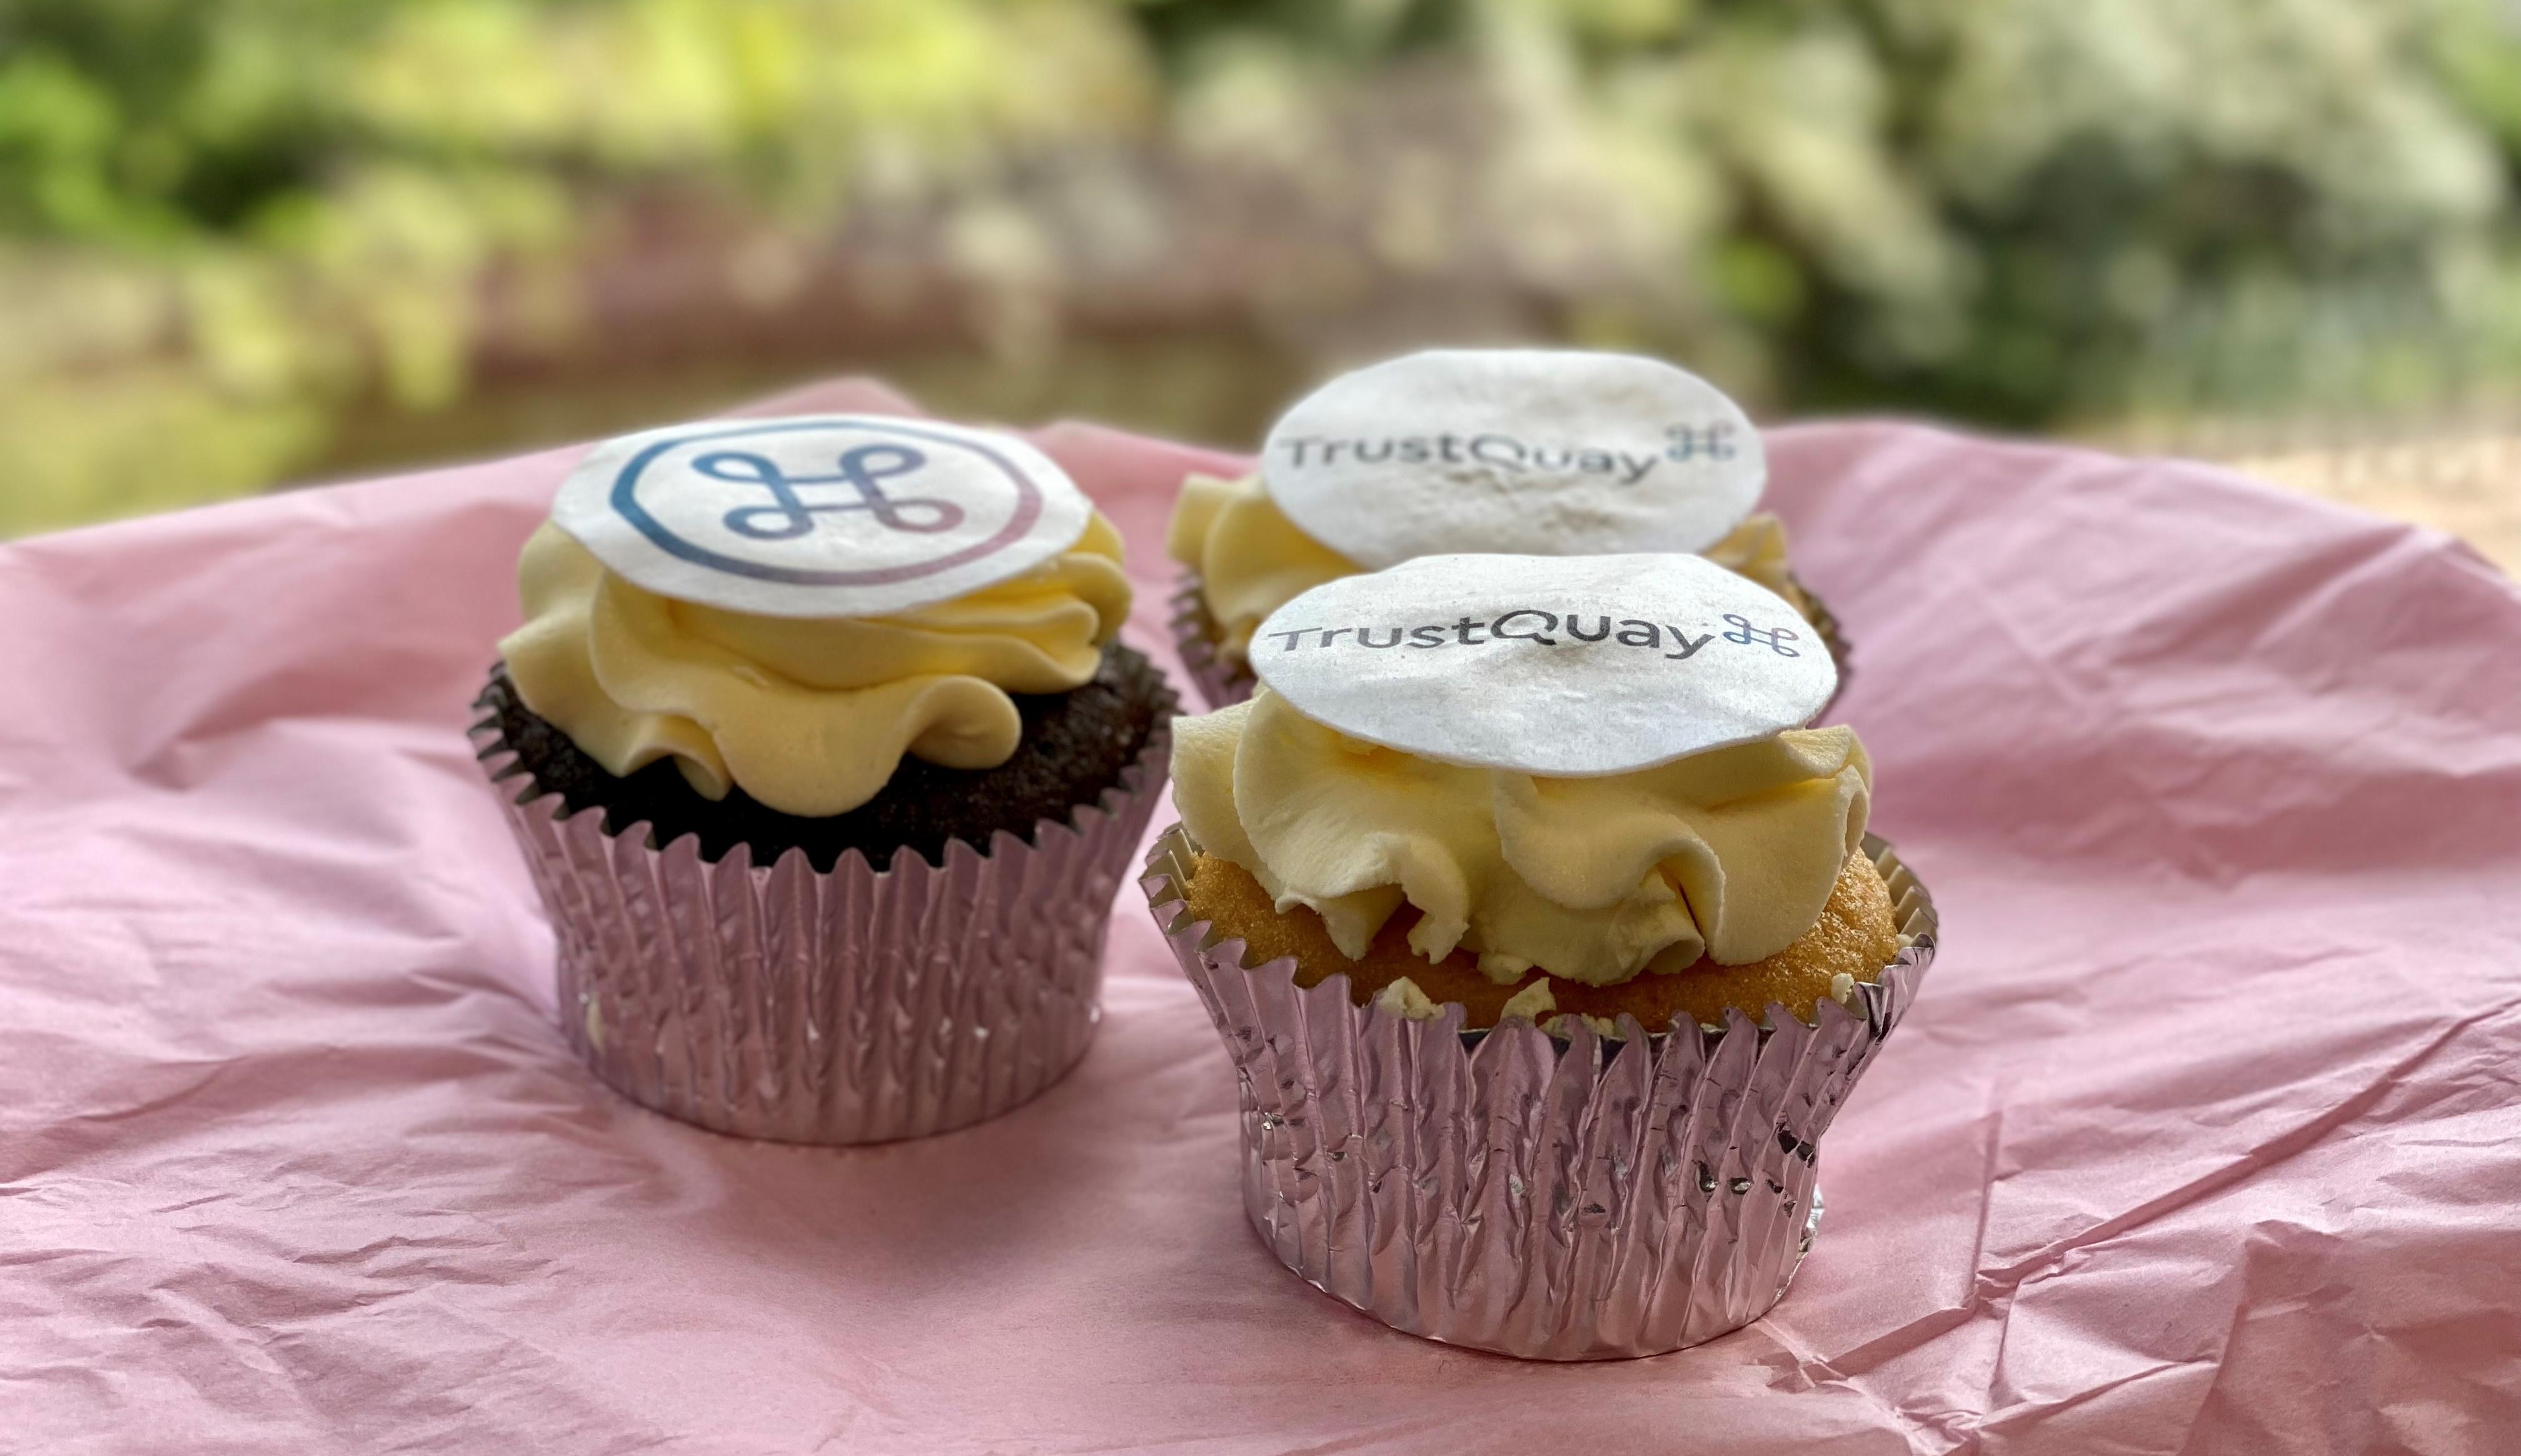 TrustQuay branded cupcakes